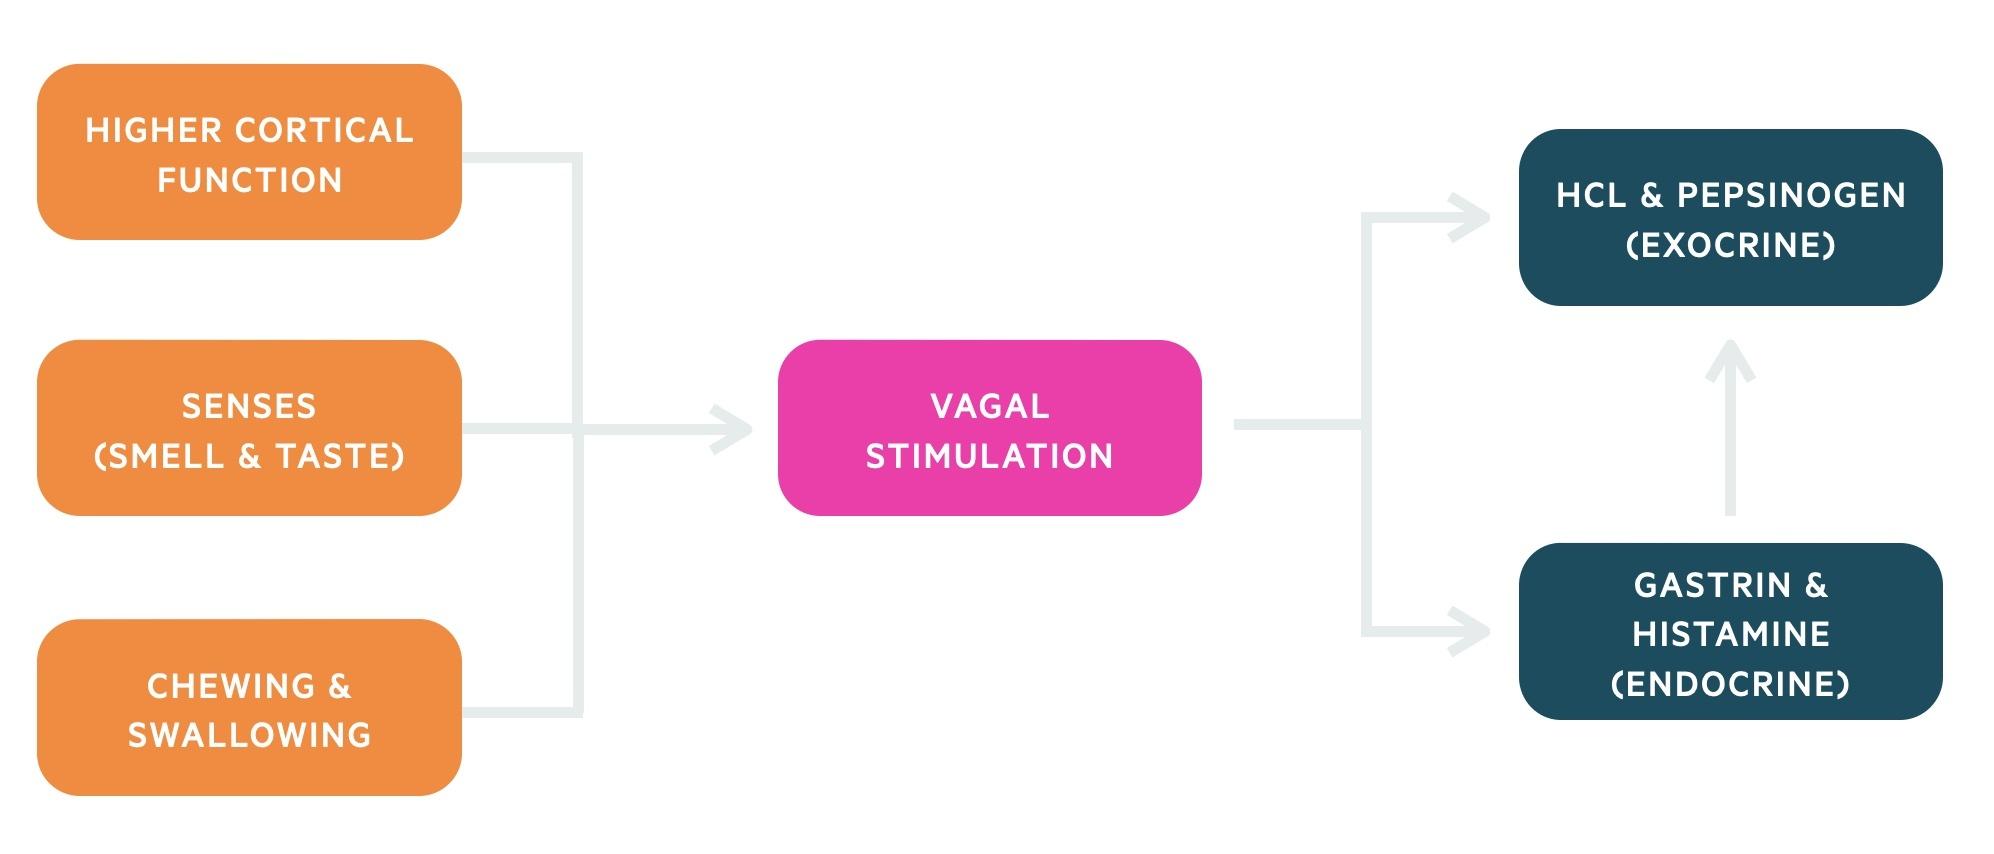 Cephalic stage of digestion